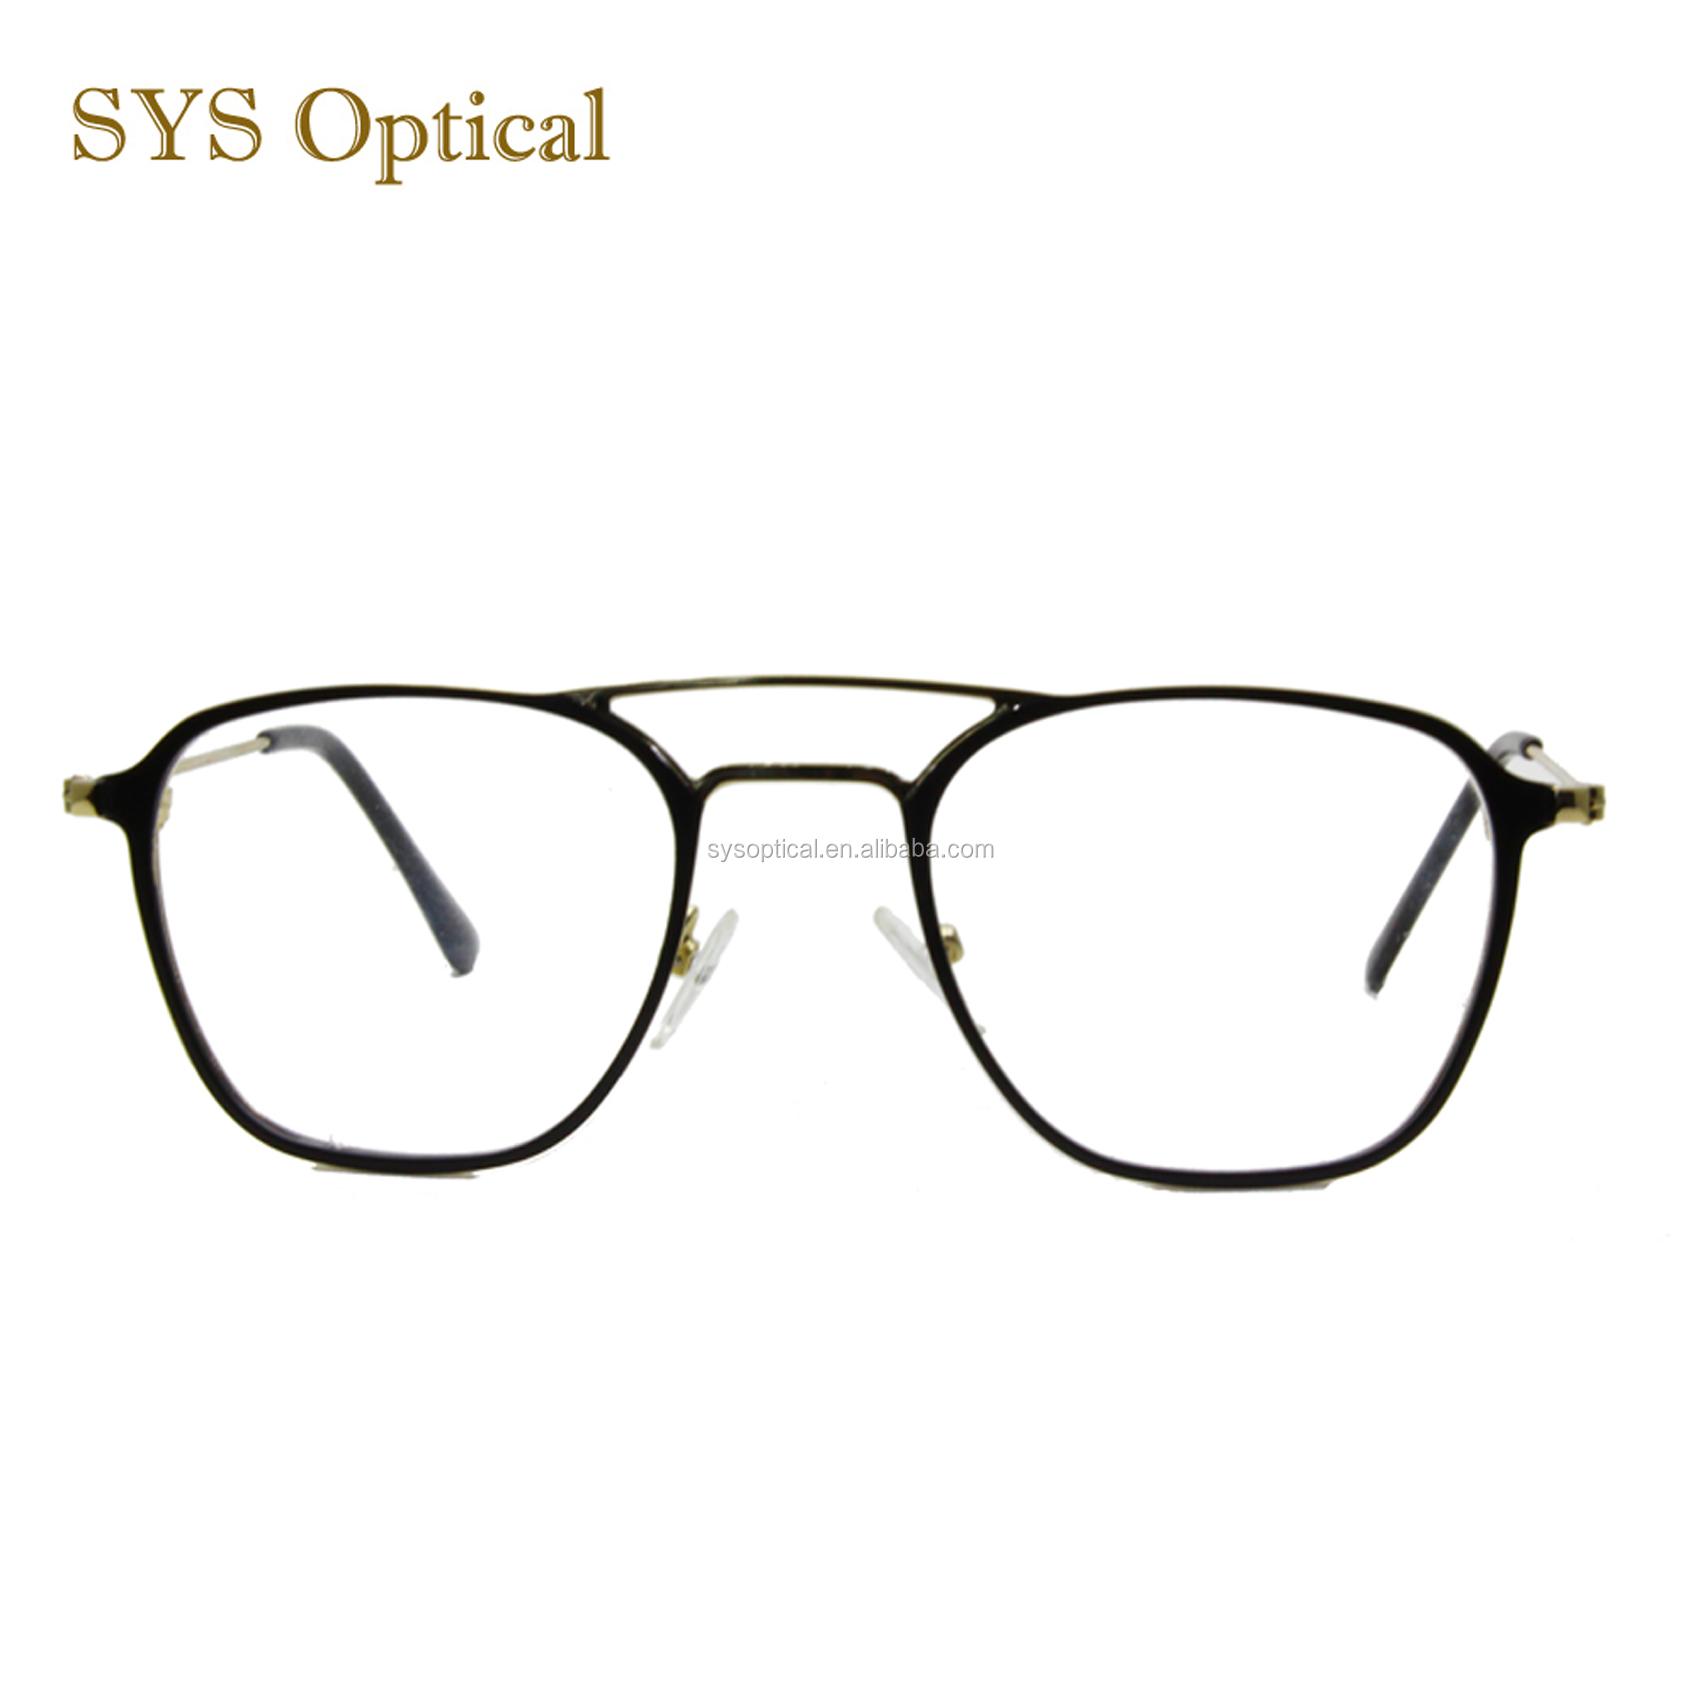 3f1dea9eff China wholesale optical eyeglasses frame OEM double beam new model metal optical  frame